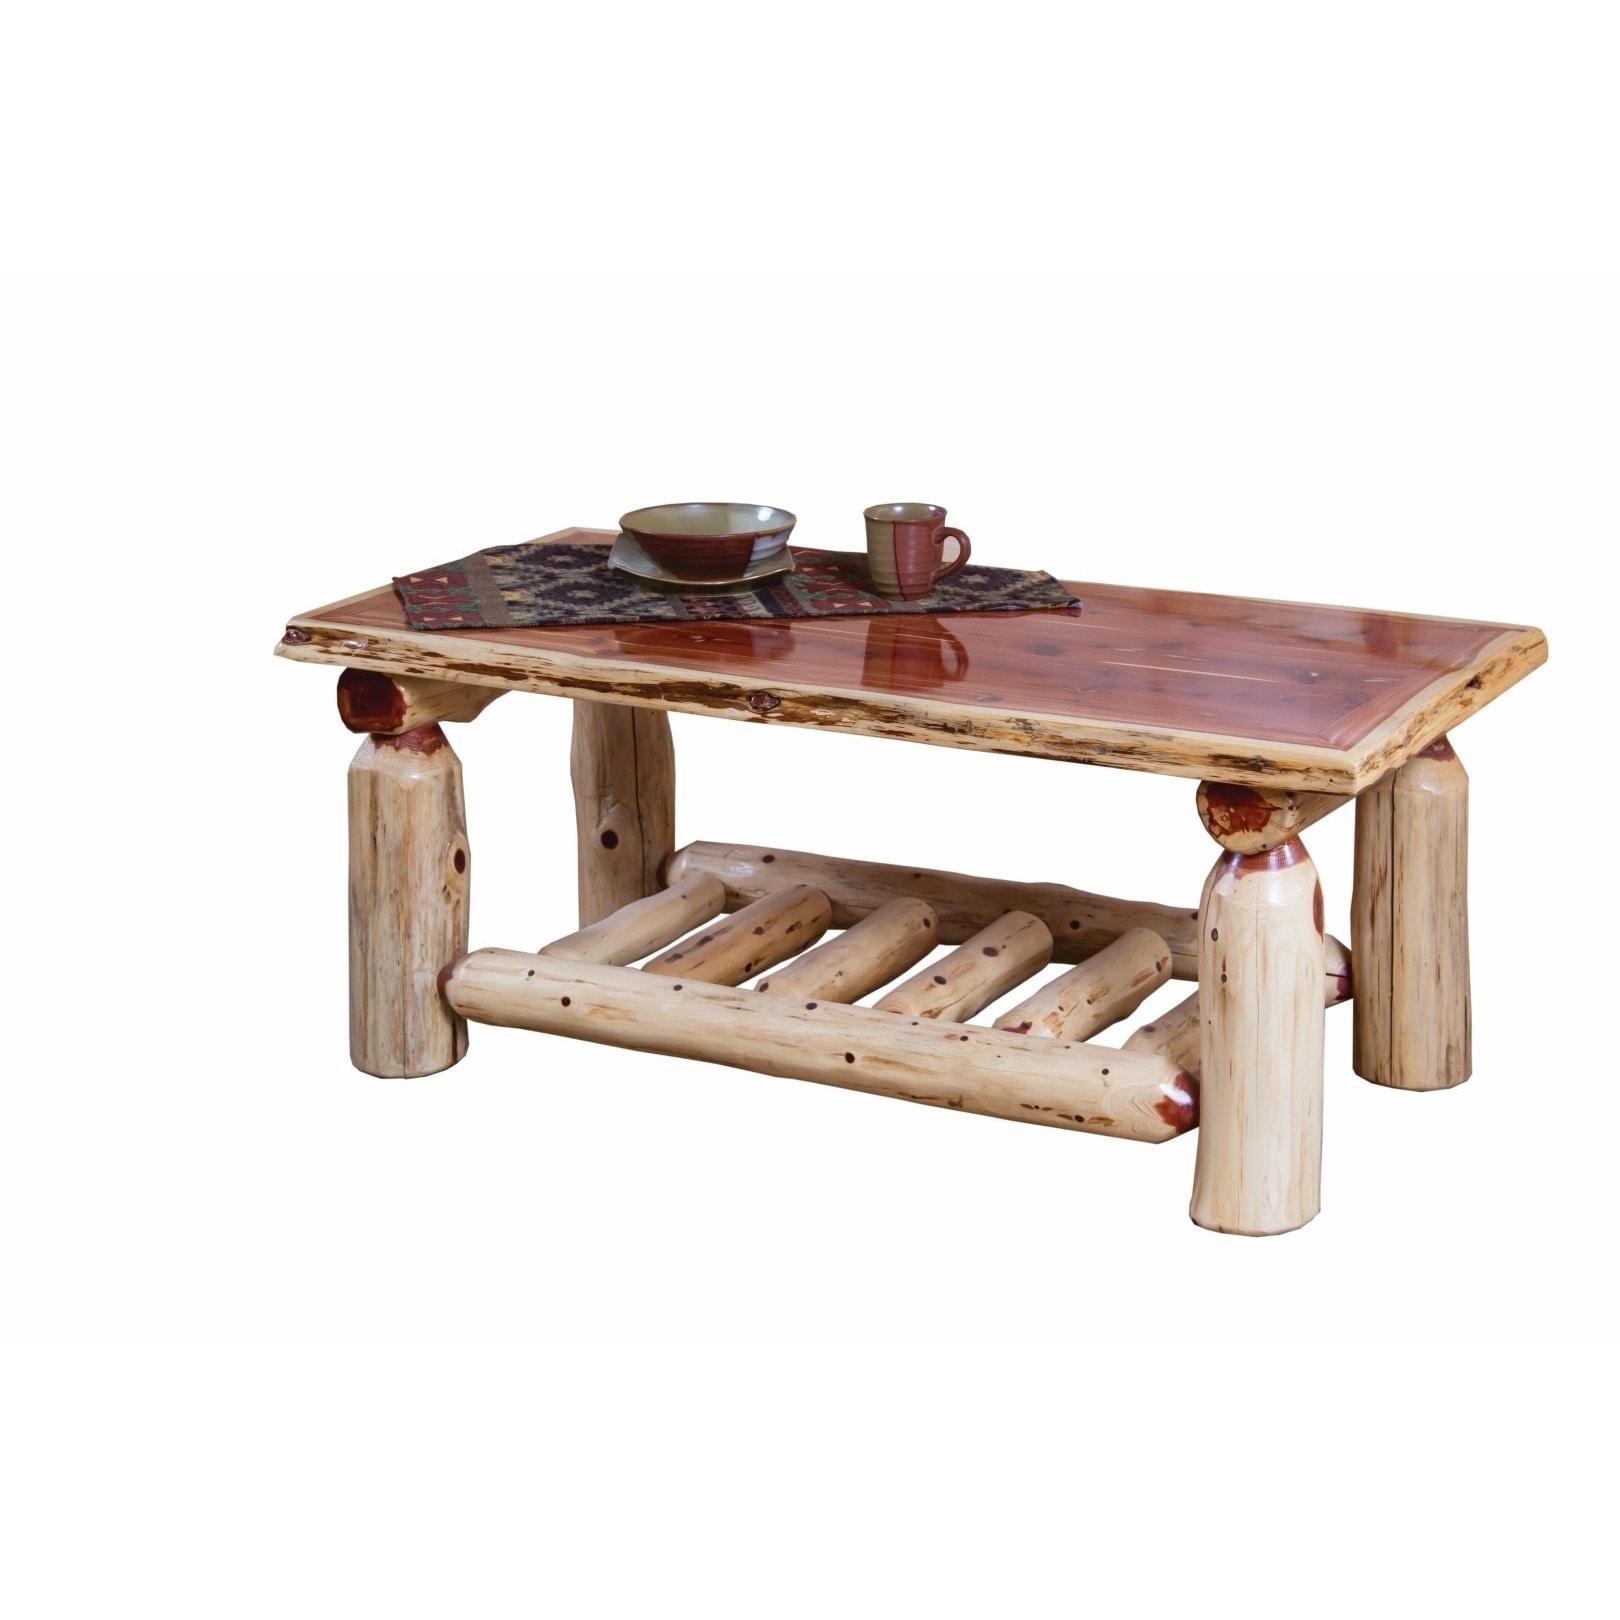 - Shop Rustic Red Cedar Log Coffee Table - Overstock - 13329676